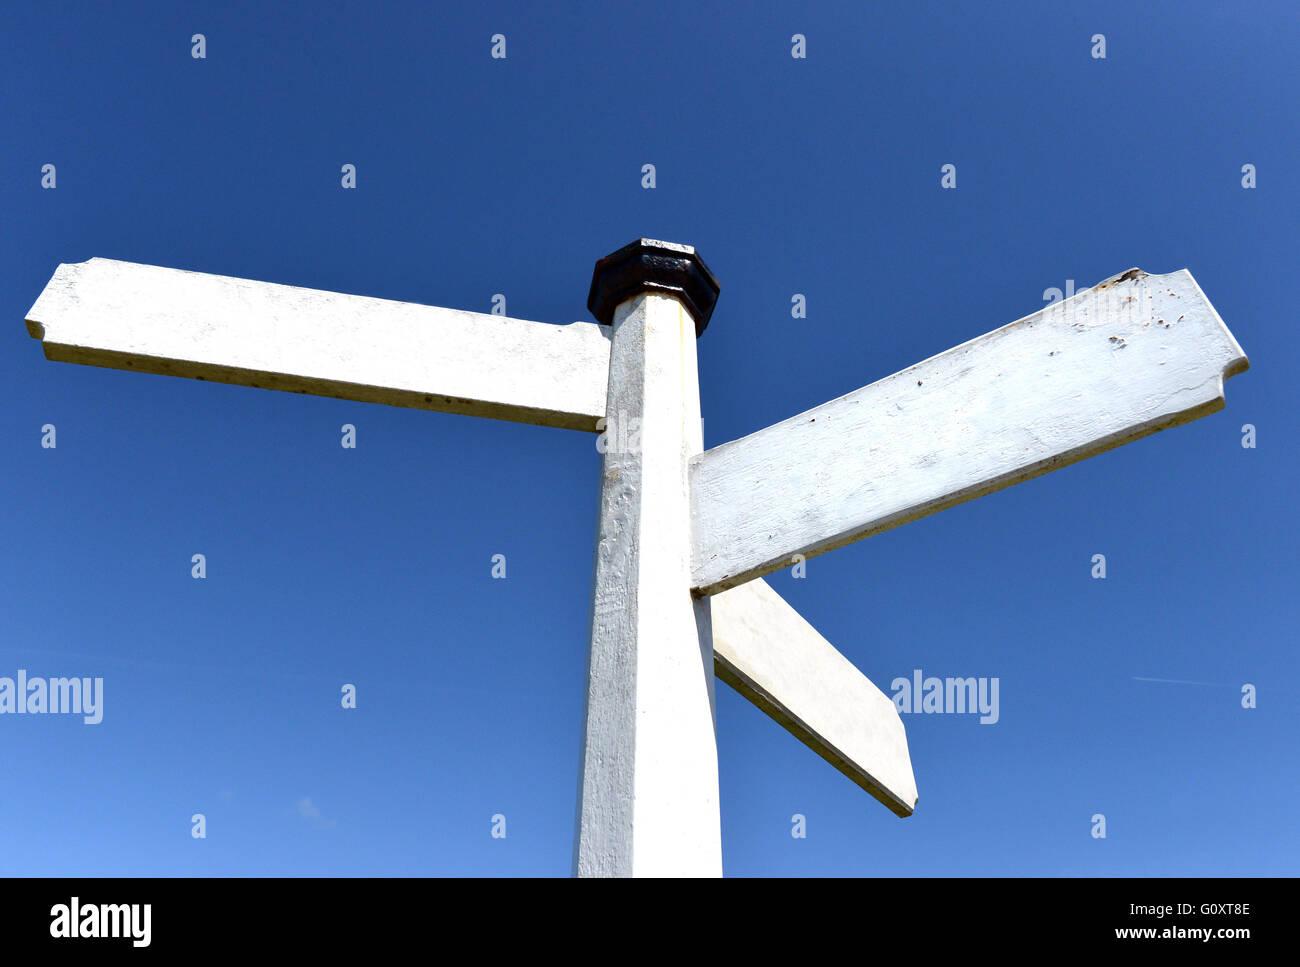 Traditionelle weiße Finger-Holzpfosten Blank / Wegweiser Stockbild